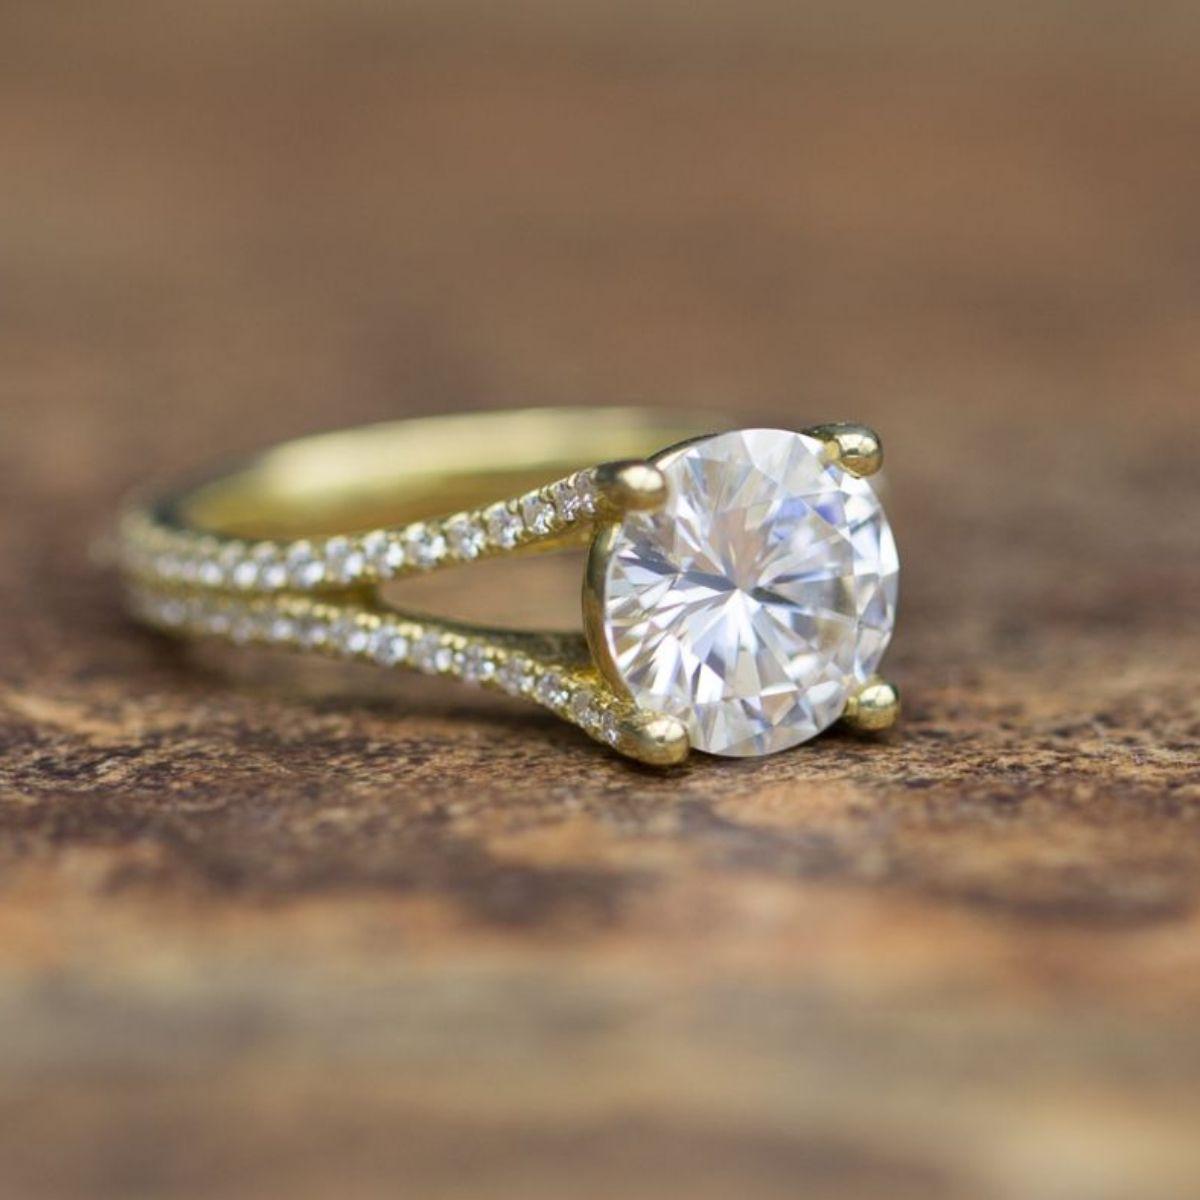 moissanite vs diamond - yellow gold pave split shank engagement ring with large moissanite